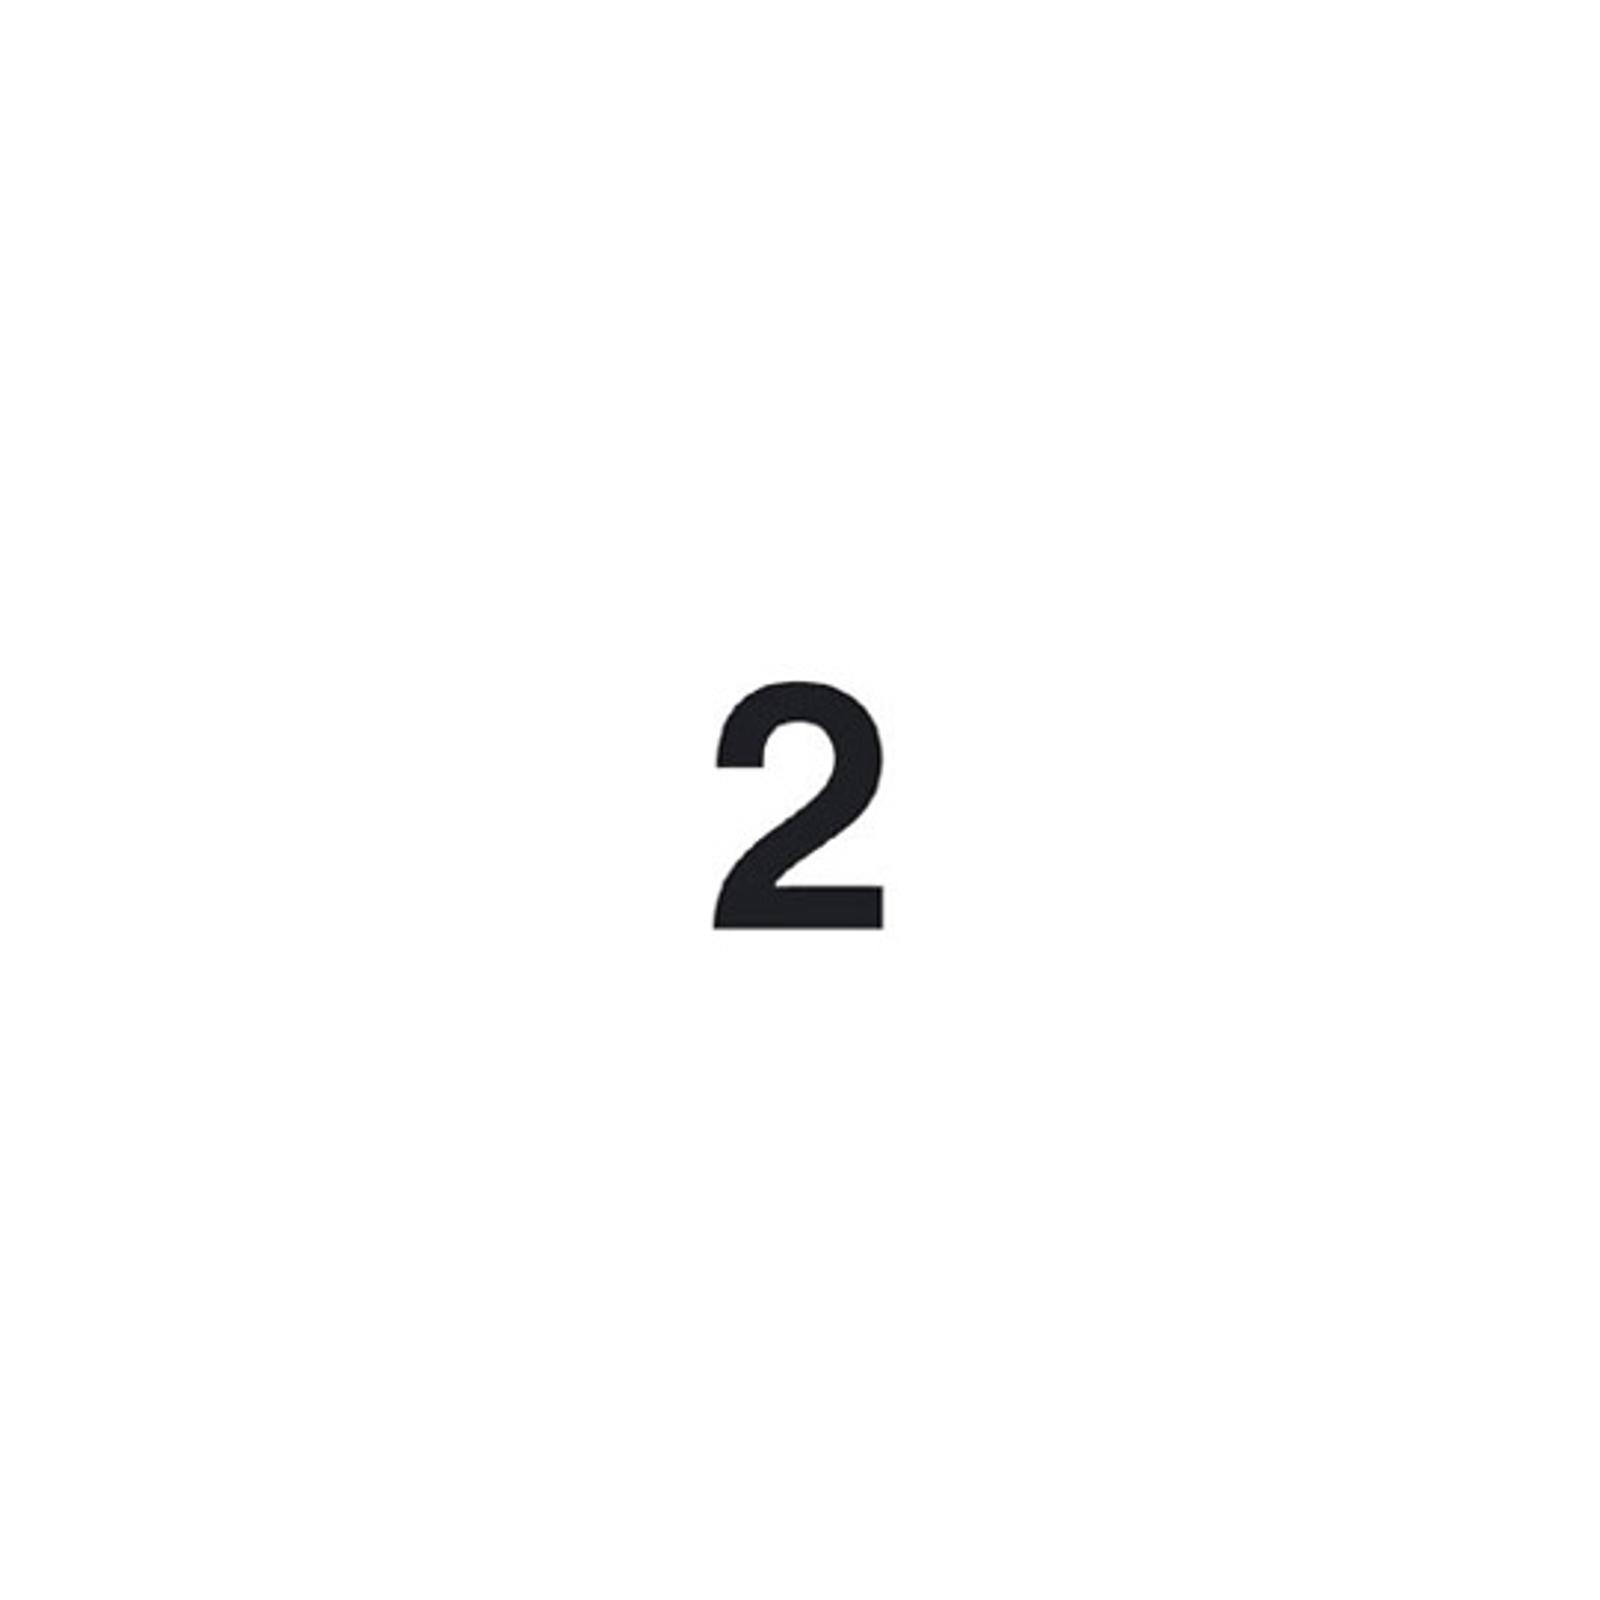 Selbstklebende Ziffer 2